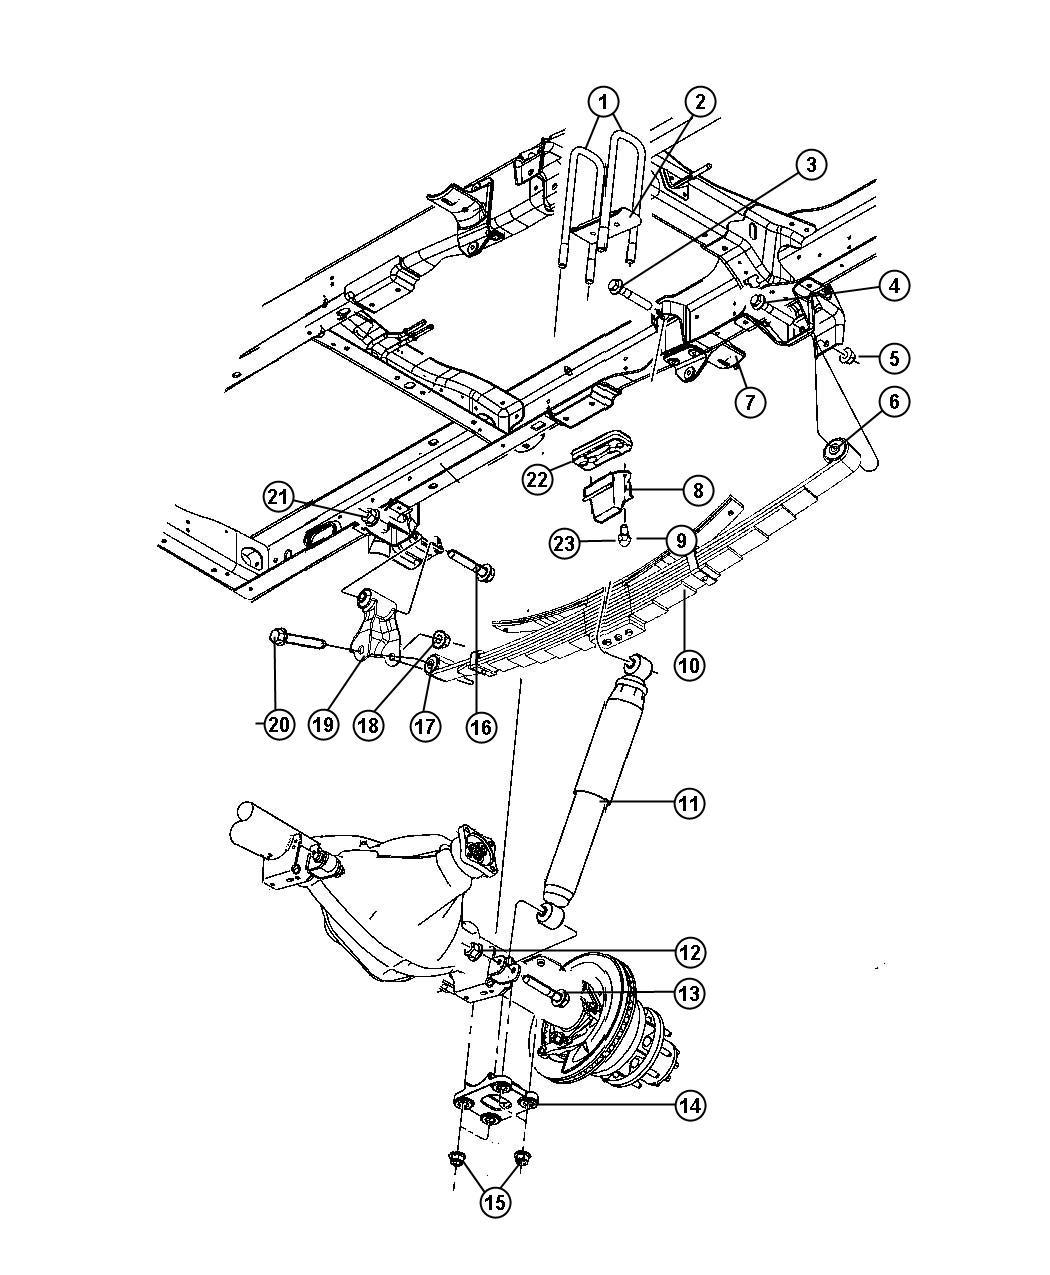 2015 dodge ram 3500 parts diagram  u2022 wiring diagram for free